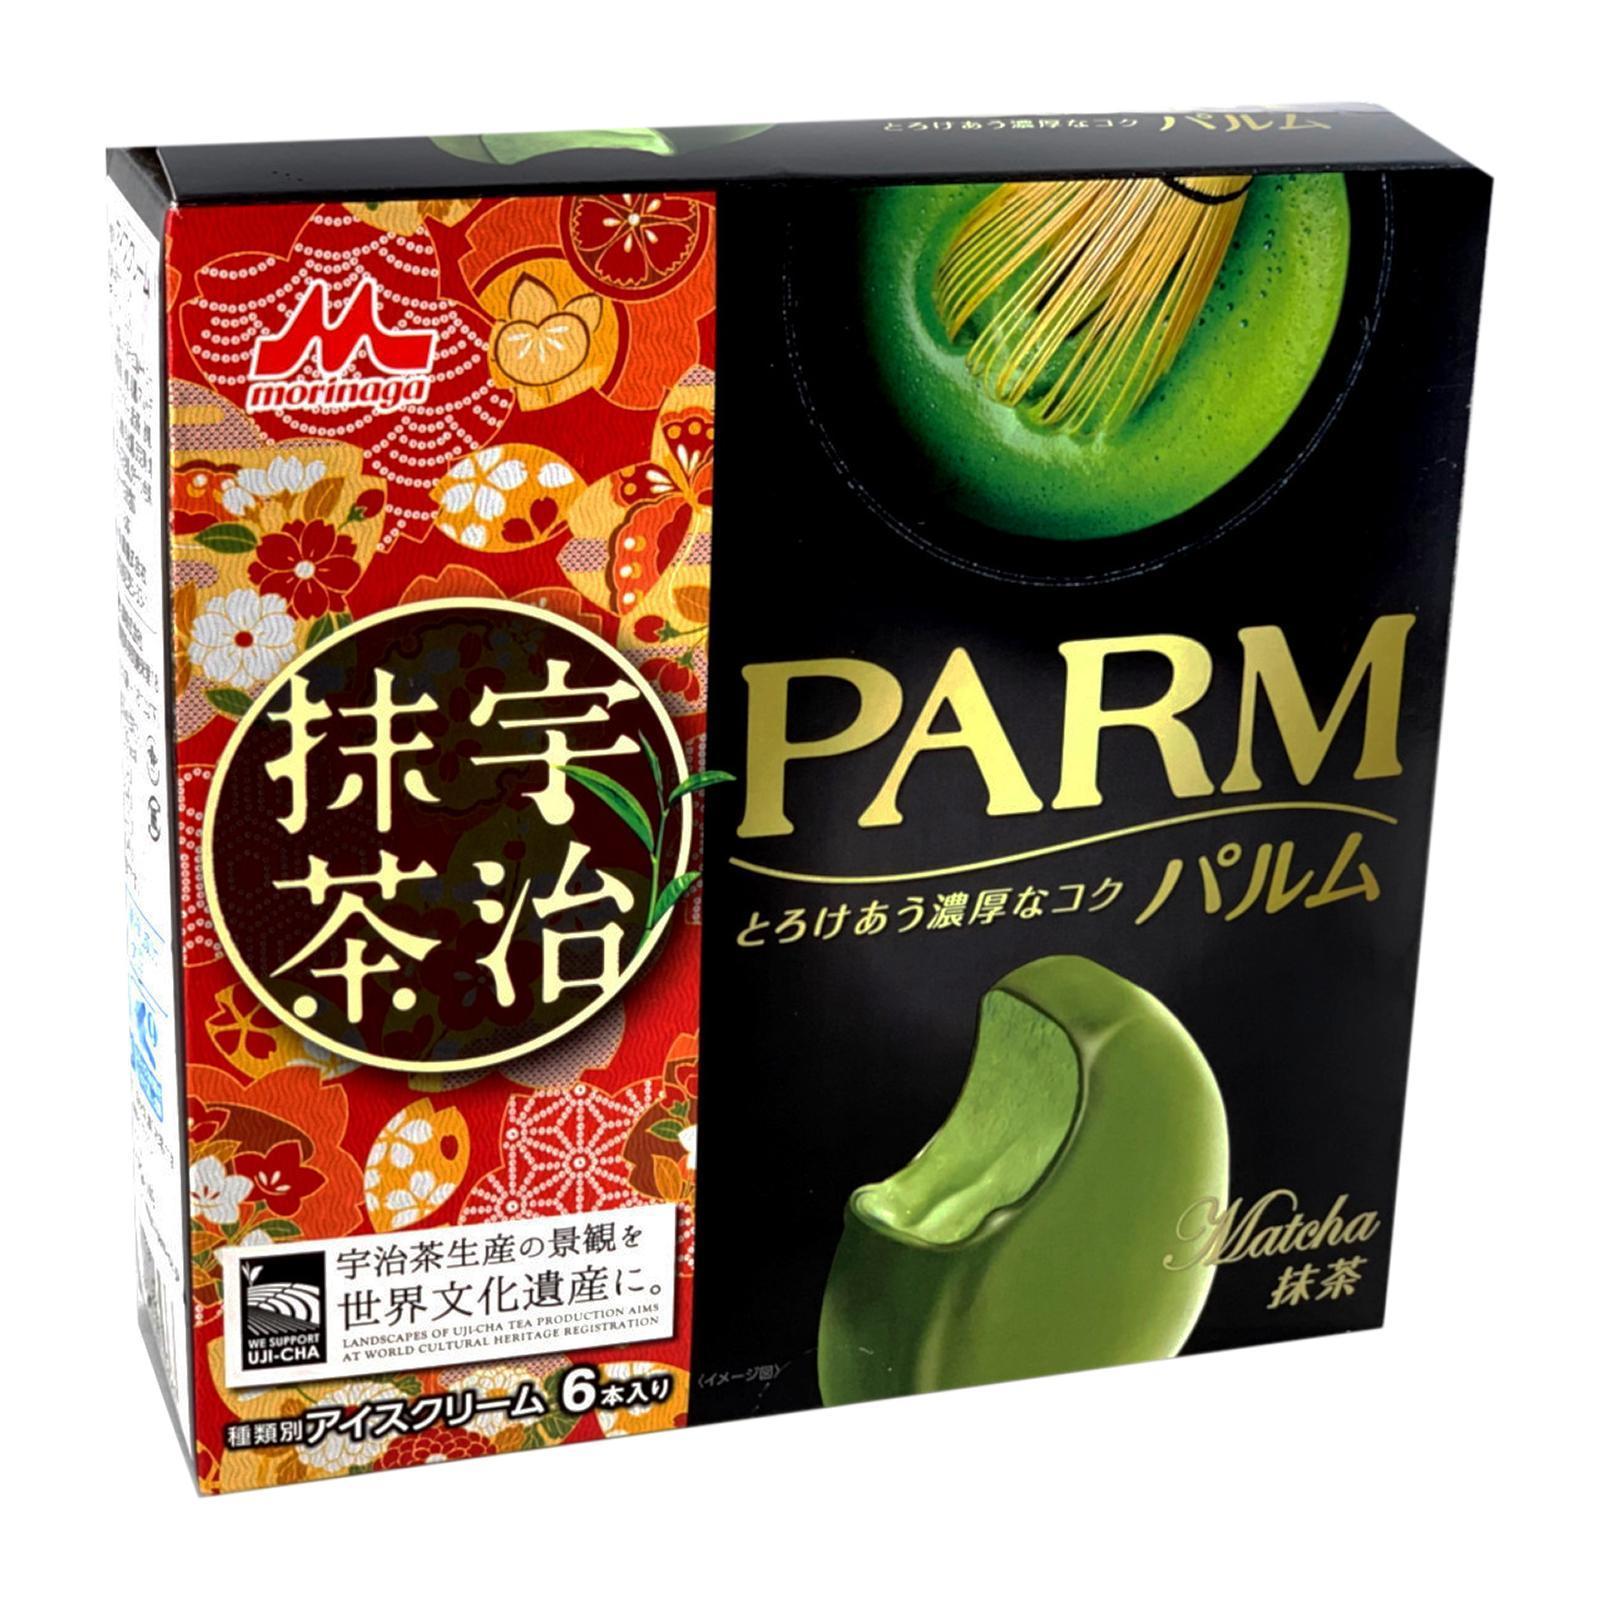 MORINAGA Parm Uji Matcha Chocolate Ice Cream Bars